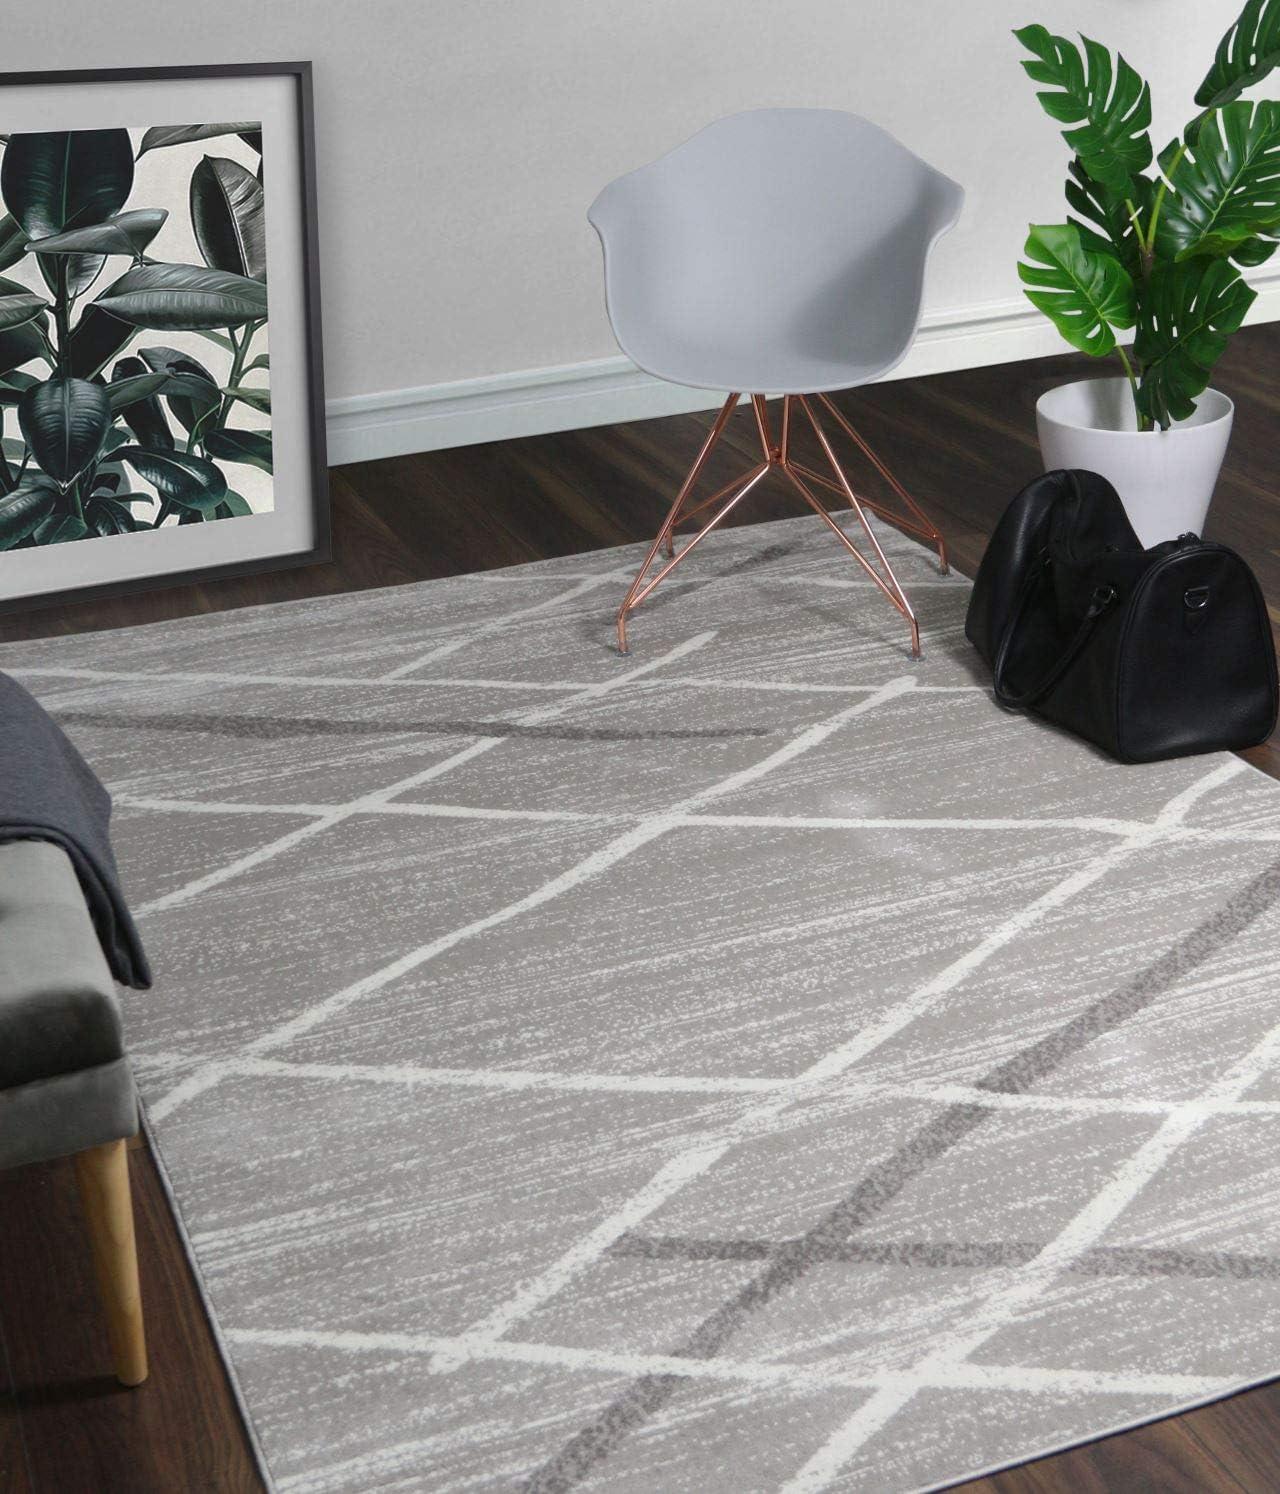 A2Z Rug Modern Contemporary Gray, Dark Gray Salvador 9957 Area Rugs 120×170 cm – 3 9 x5 6 ft